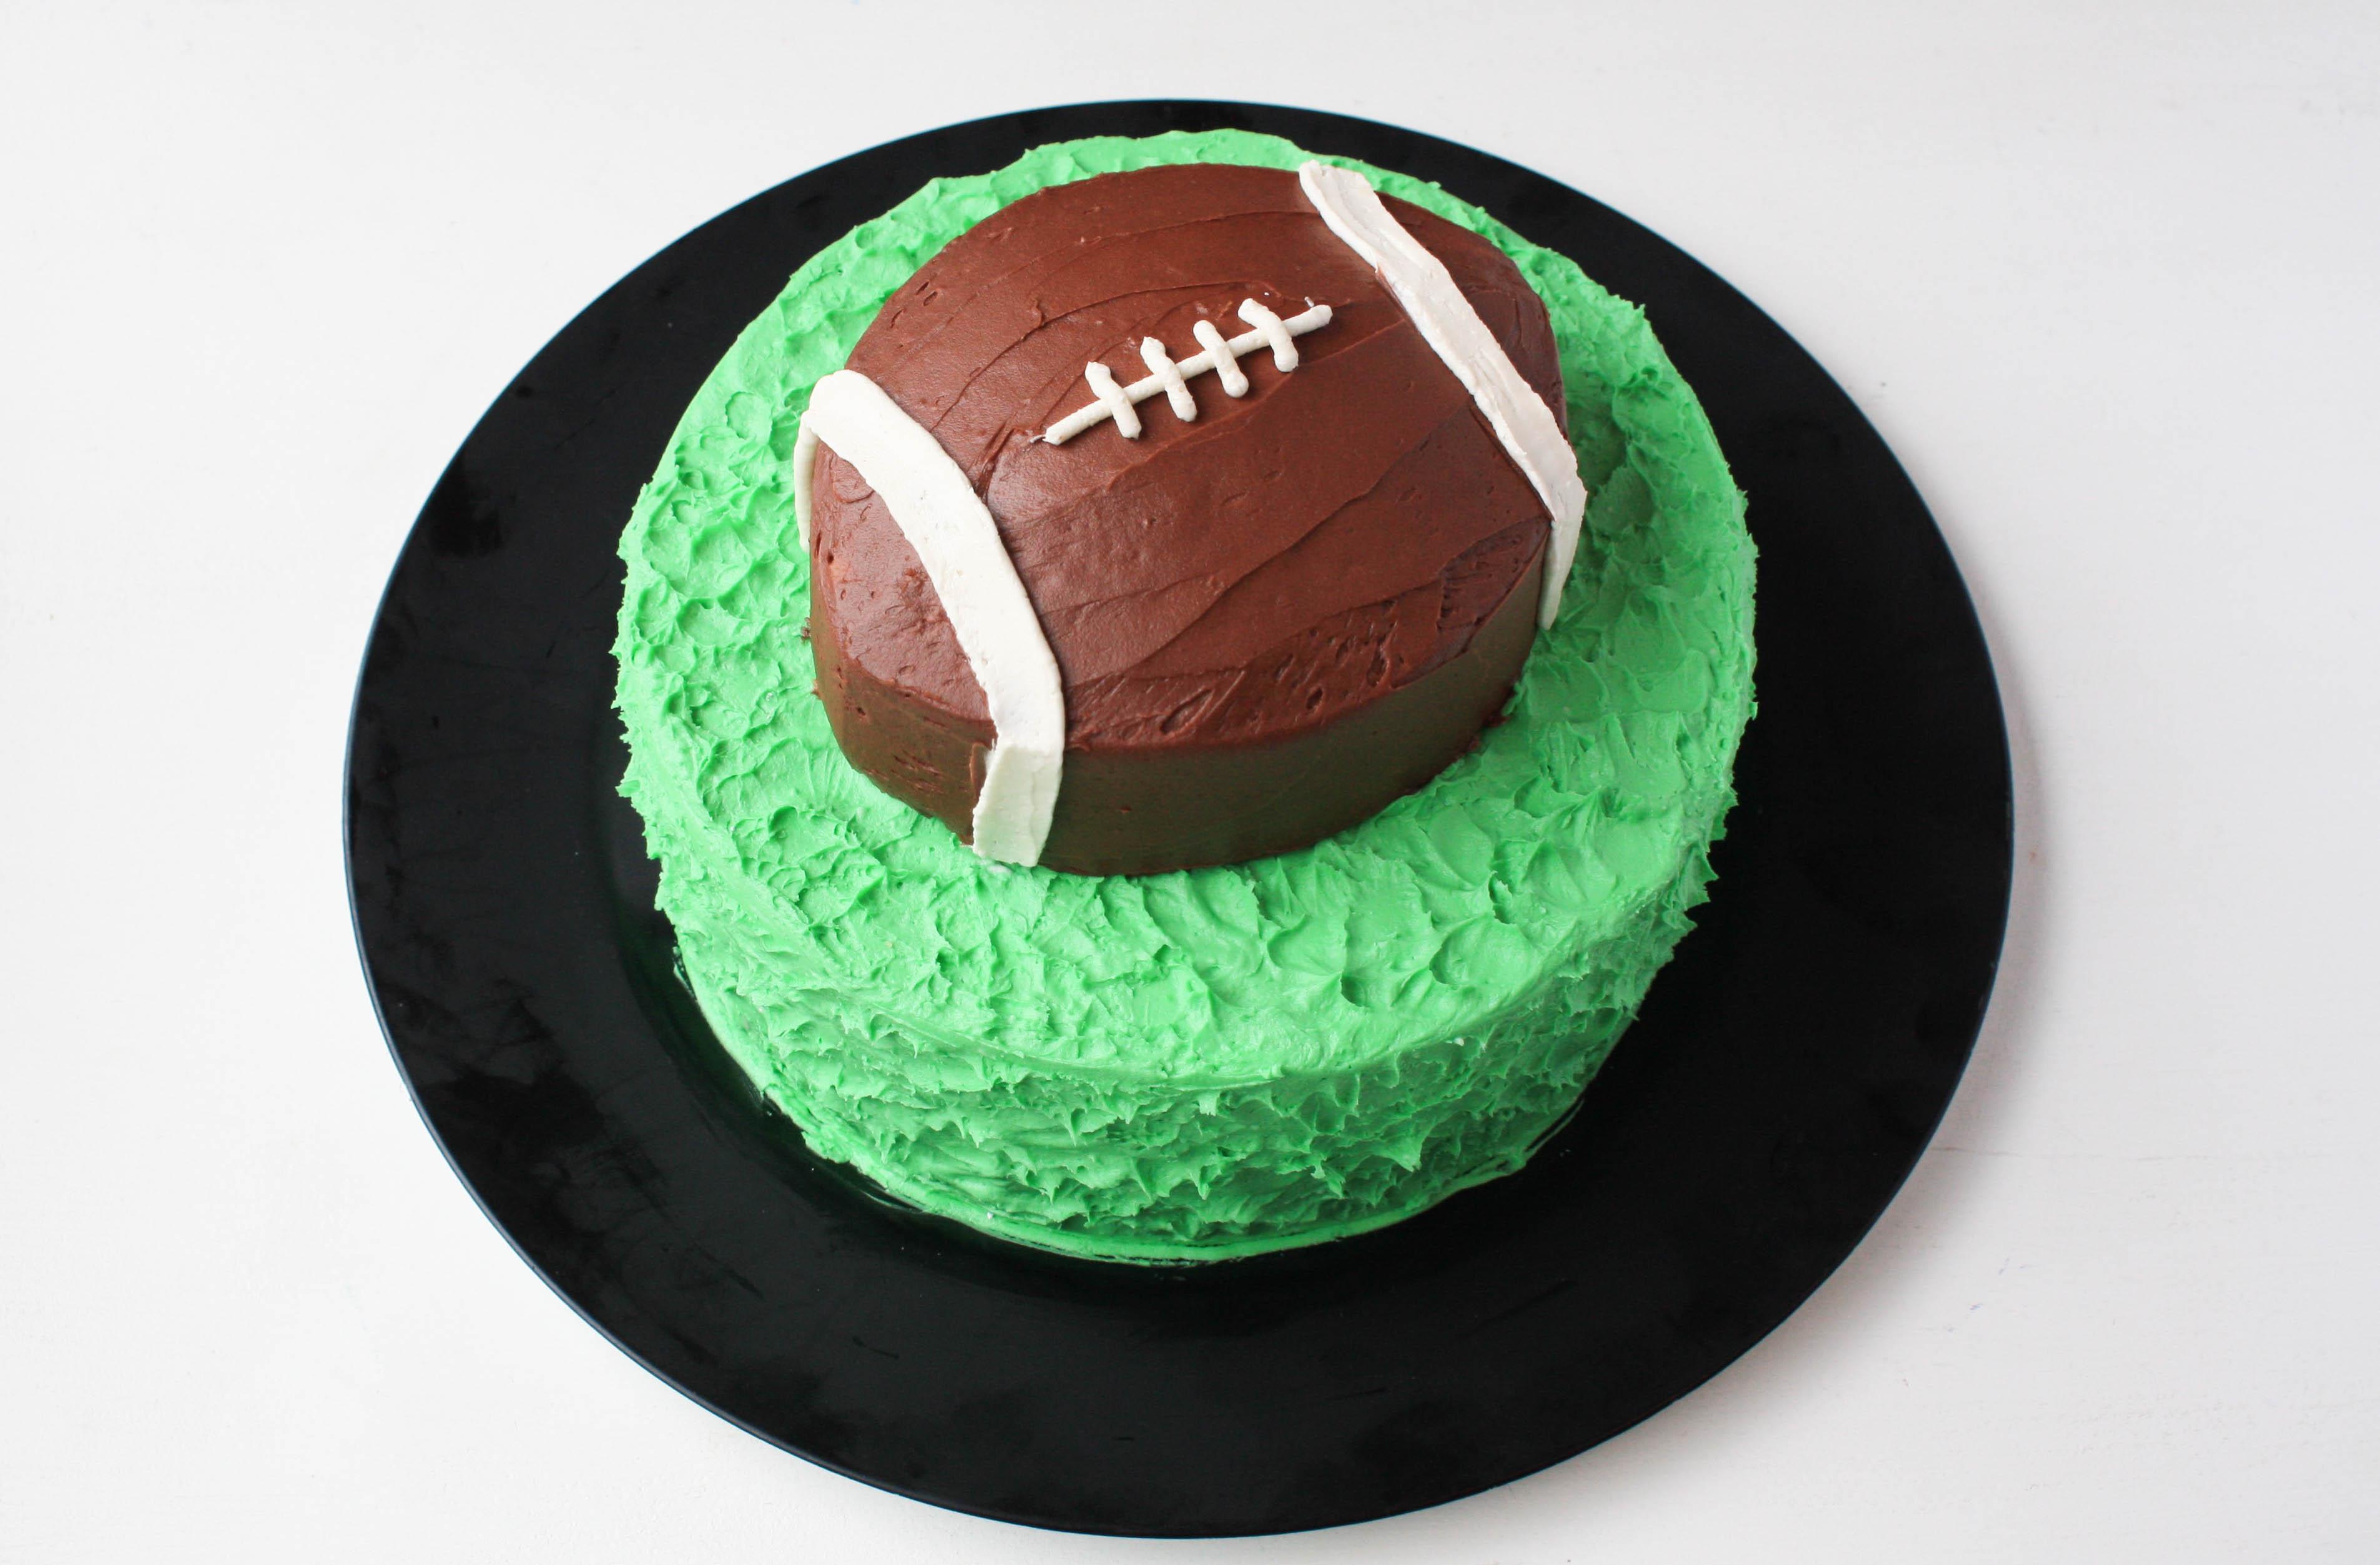 How To Make An Easy Football Cake   Erin Gardner   Bluprint